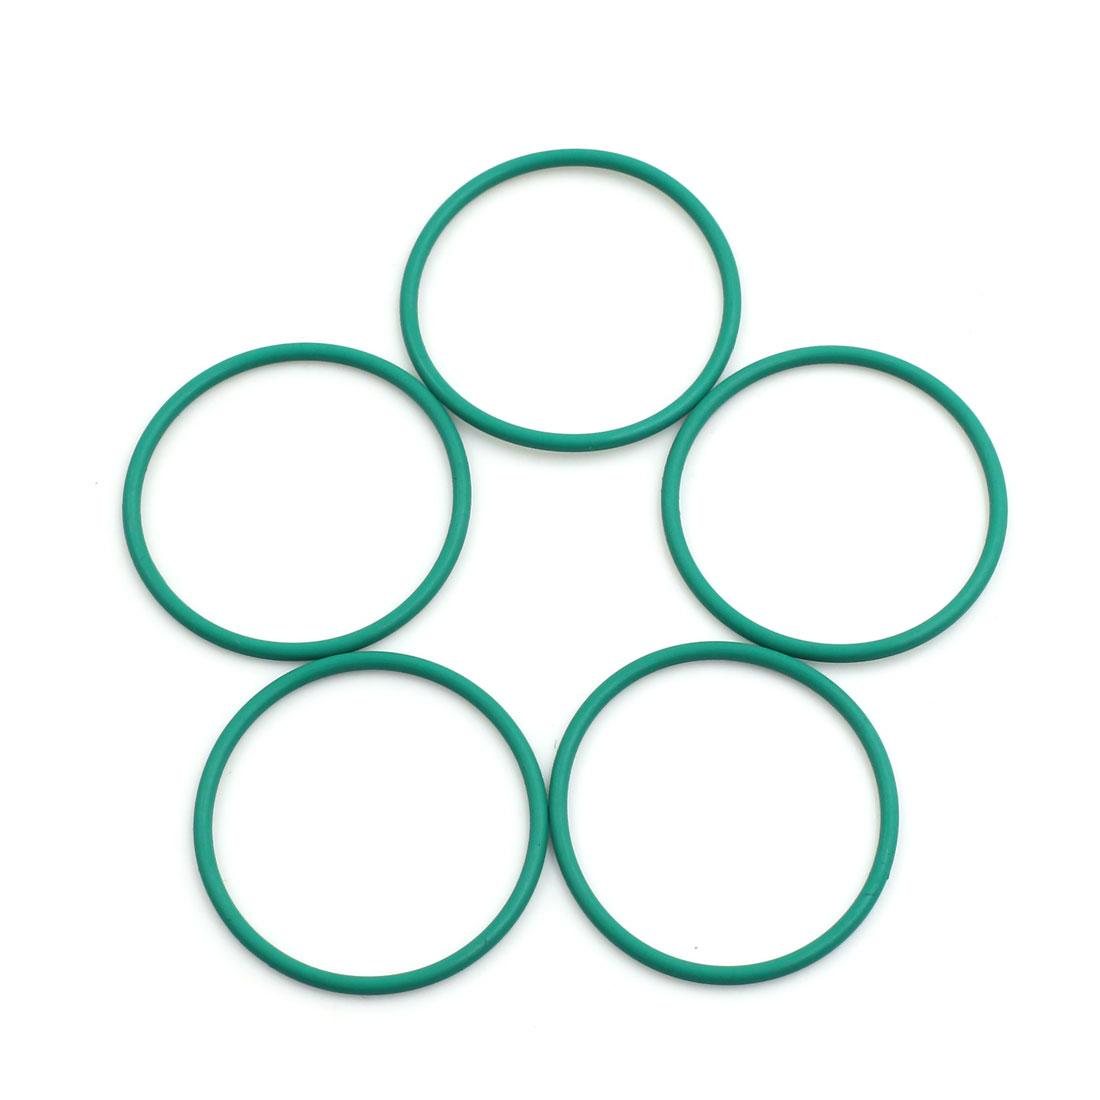 5pcs Green Universal FKM O-Ring Sealing Gasket Washer for Car 36mm x 2mm